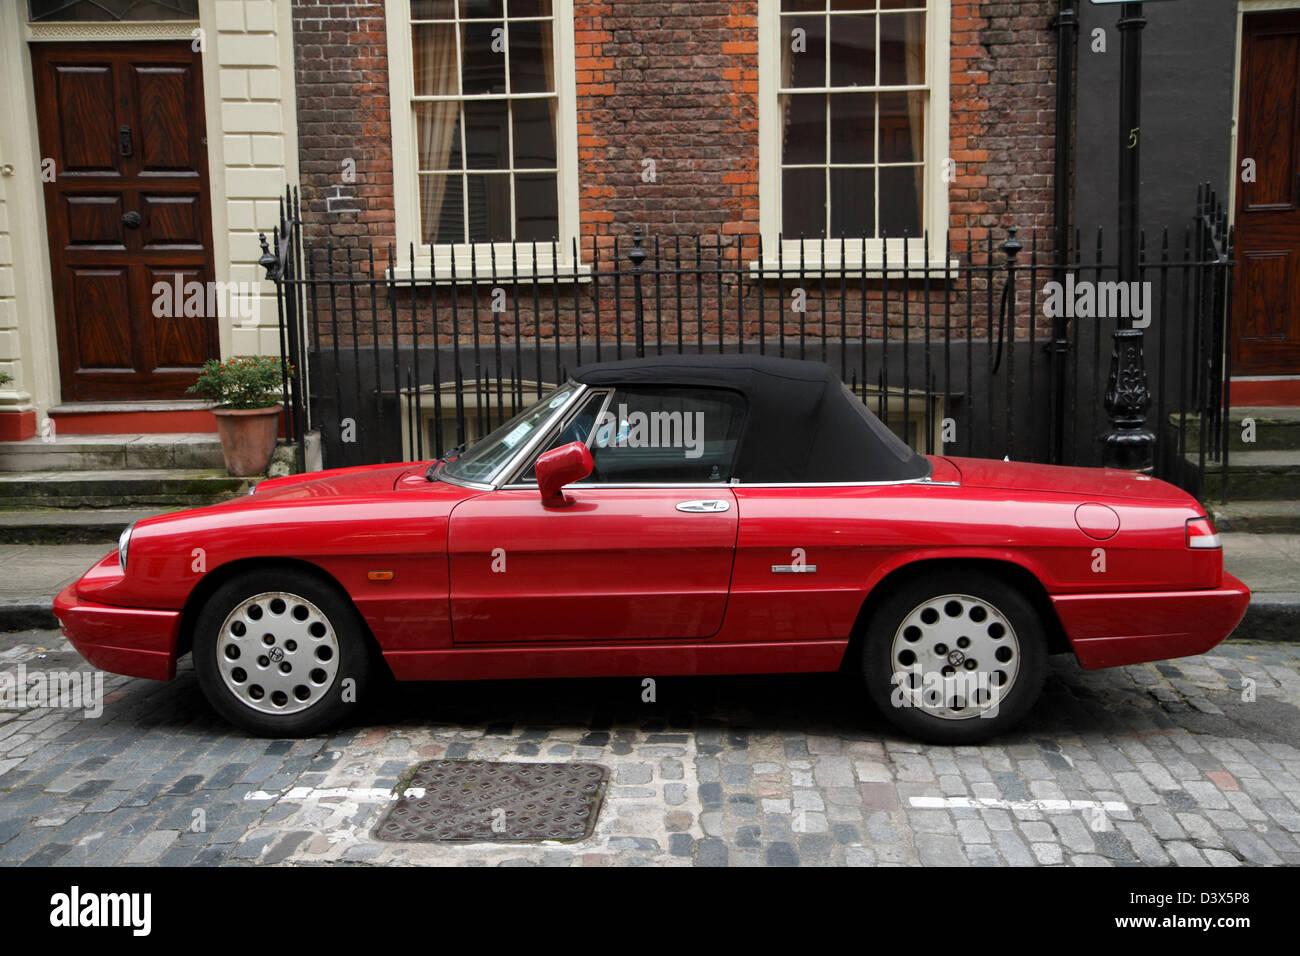 Alfa Romeo Spyder in London Straße geparkt. Stockbild